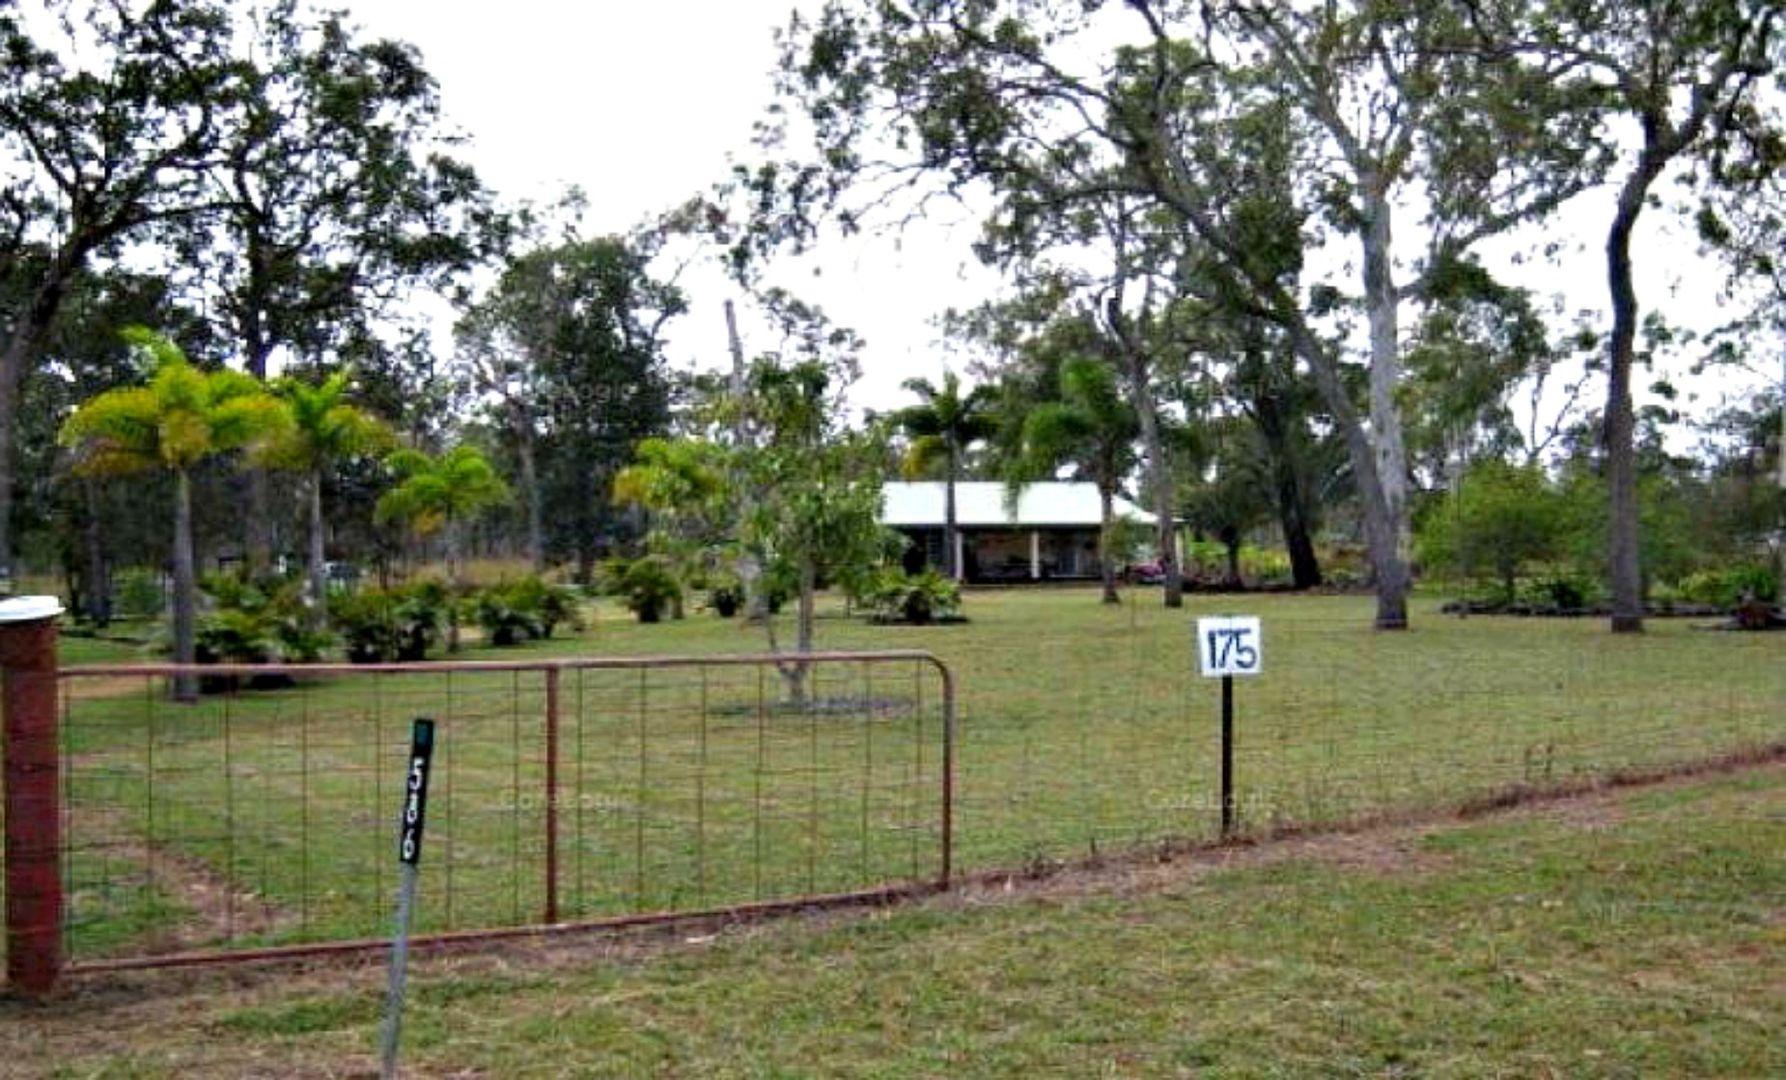 586 Millstream Pde, Millstream QLD 4888, Image 0